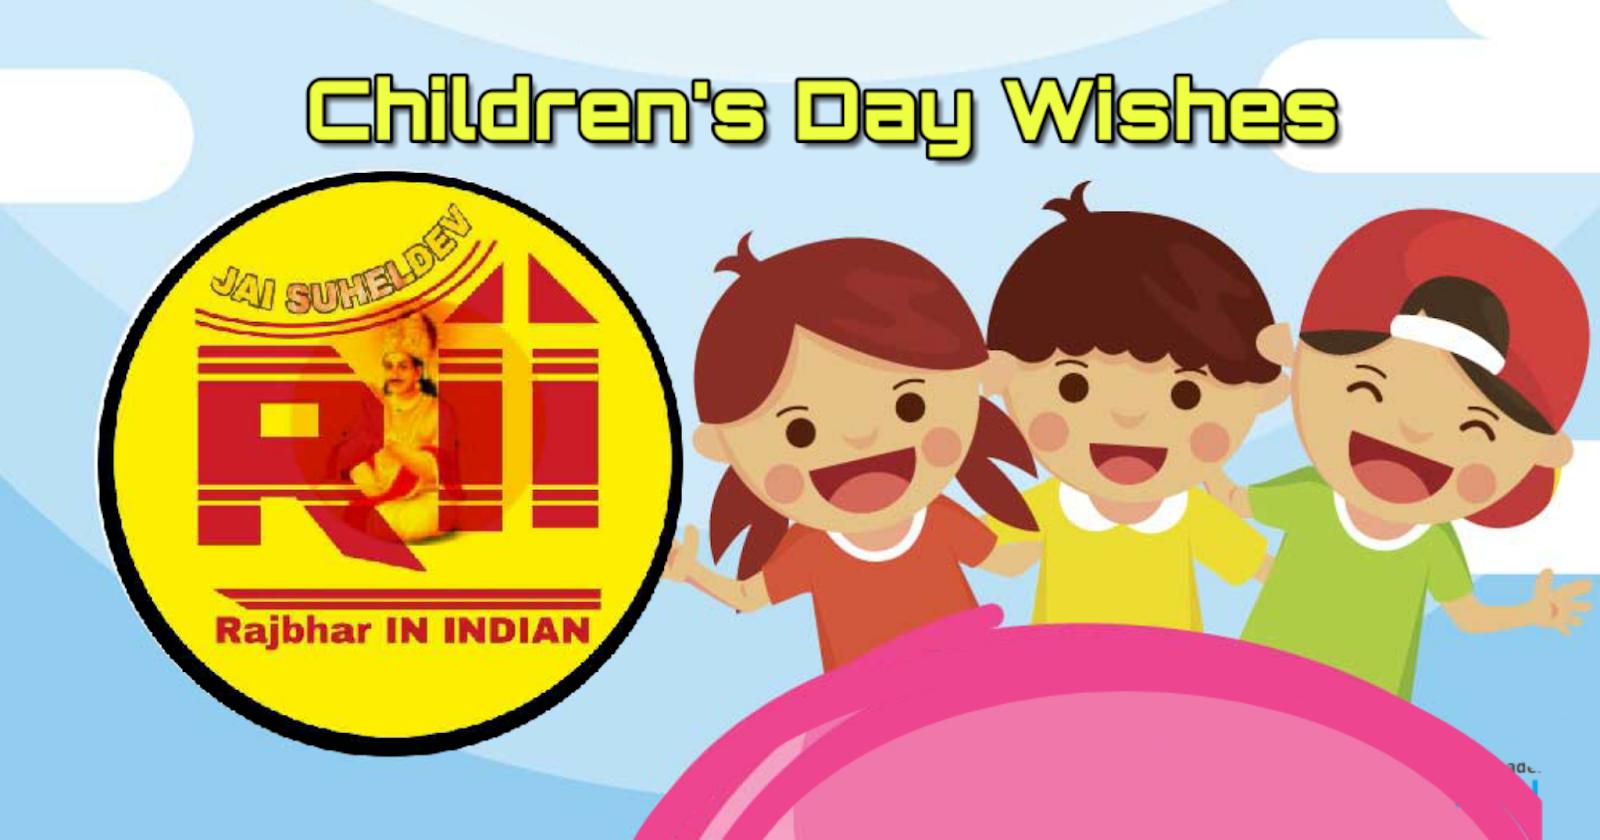 %2523HappyChildensDay Best Children's Day Wishes in hindi || Rajbhar IN INDIA